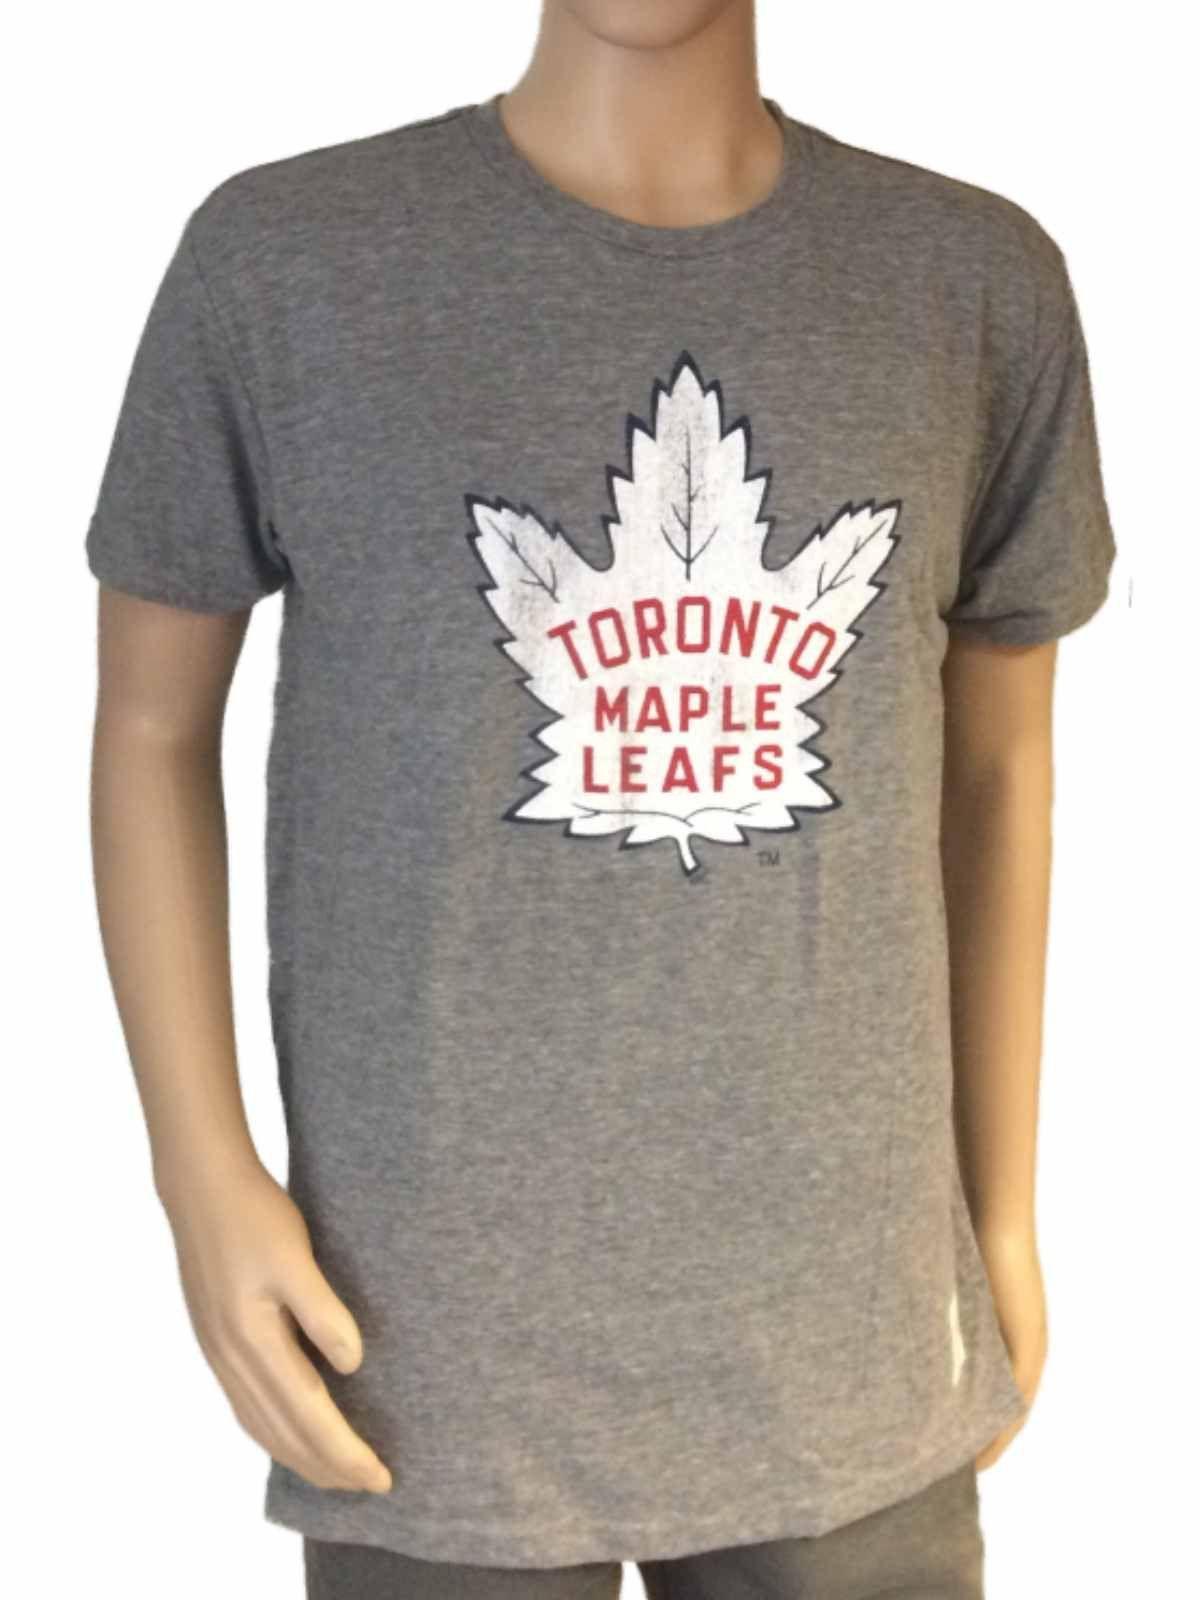 Toronto Maple Leafs Retro Brand Gray Tri-Blend Distressed Logo SS T-Shirt f5d90b10a